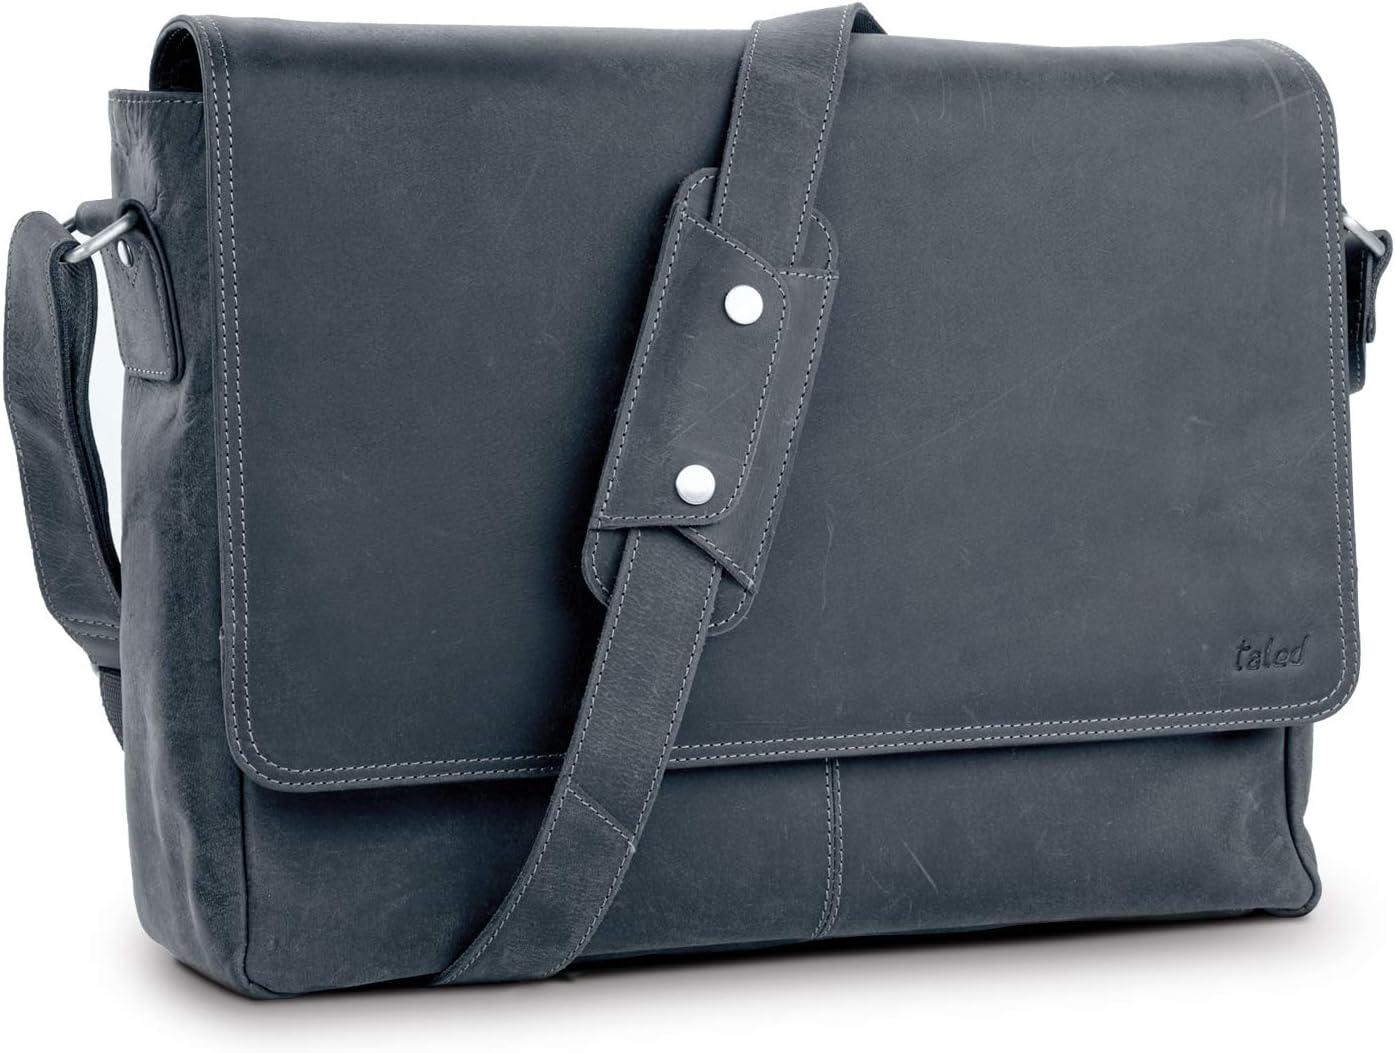 TALED® Premium Messenger Bag Herren-schwarz –